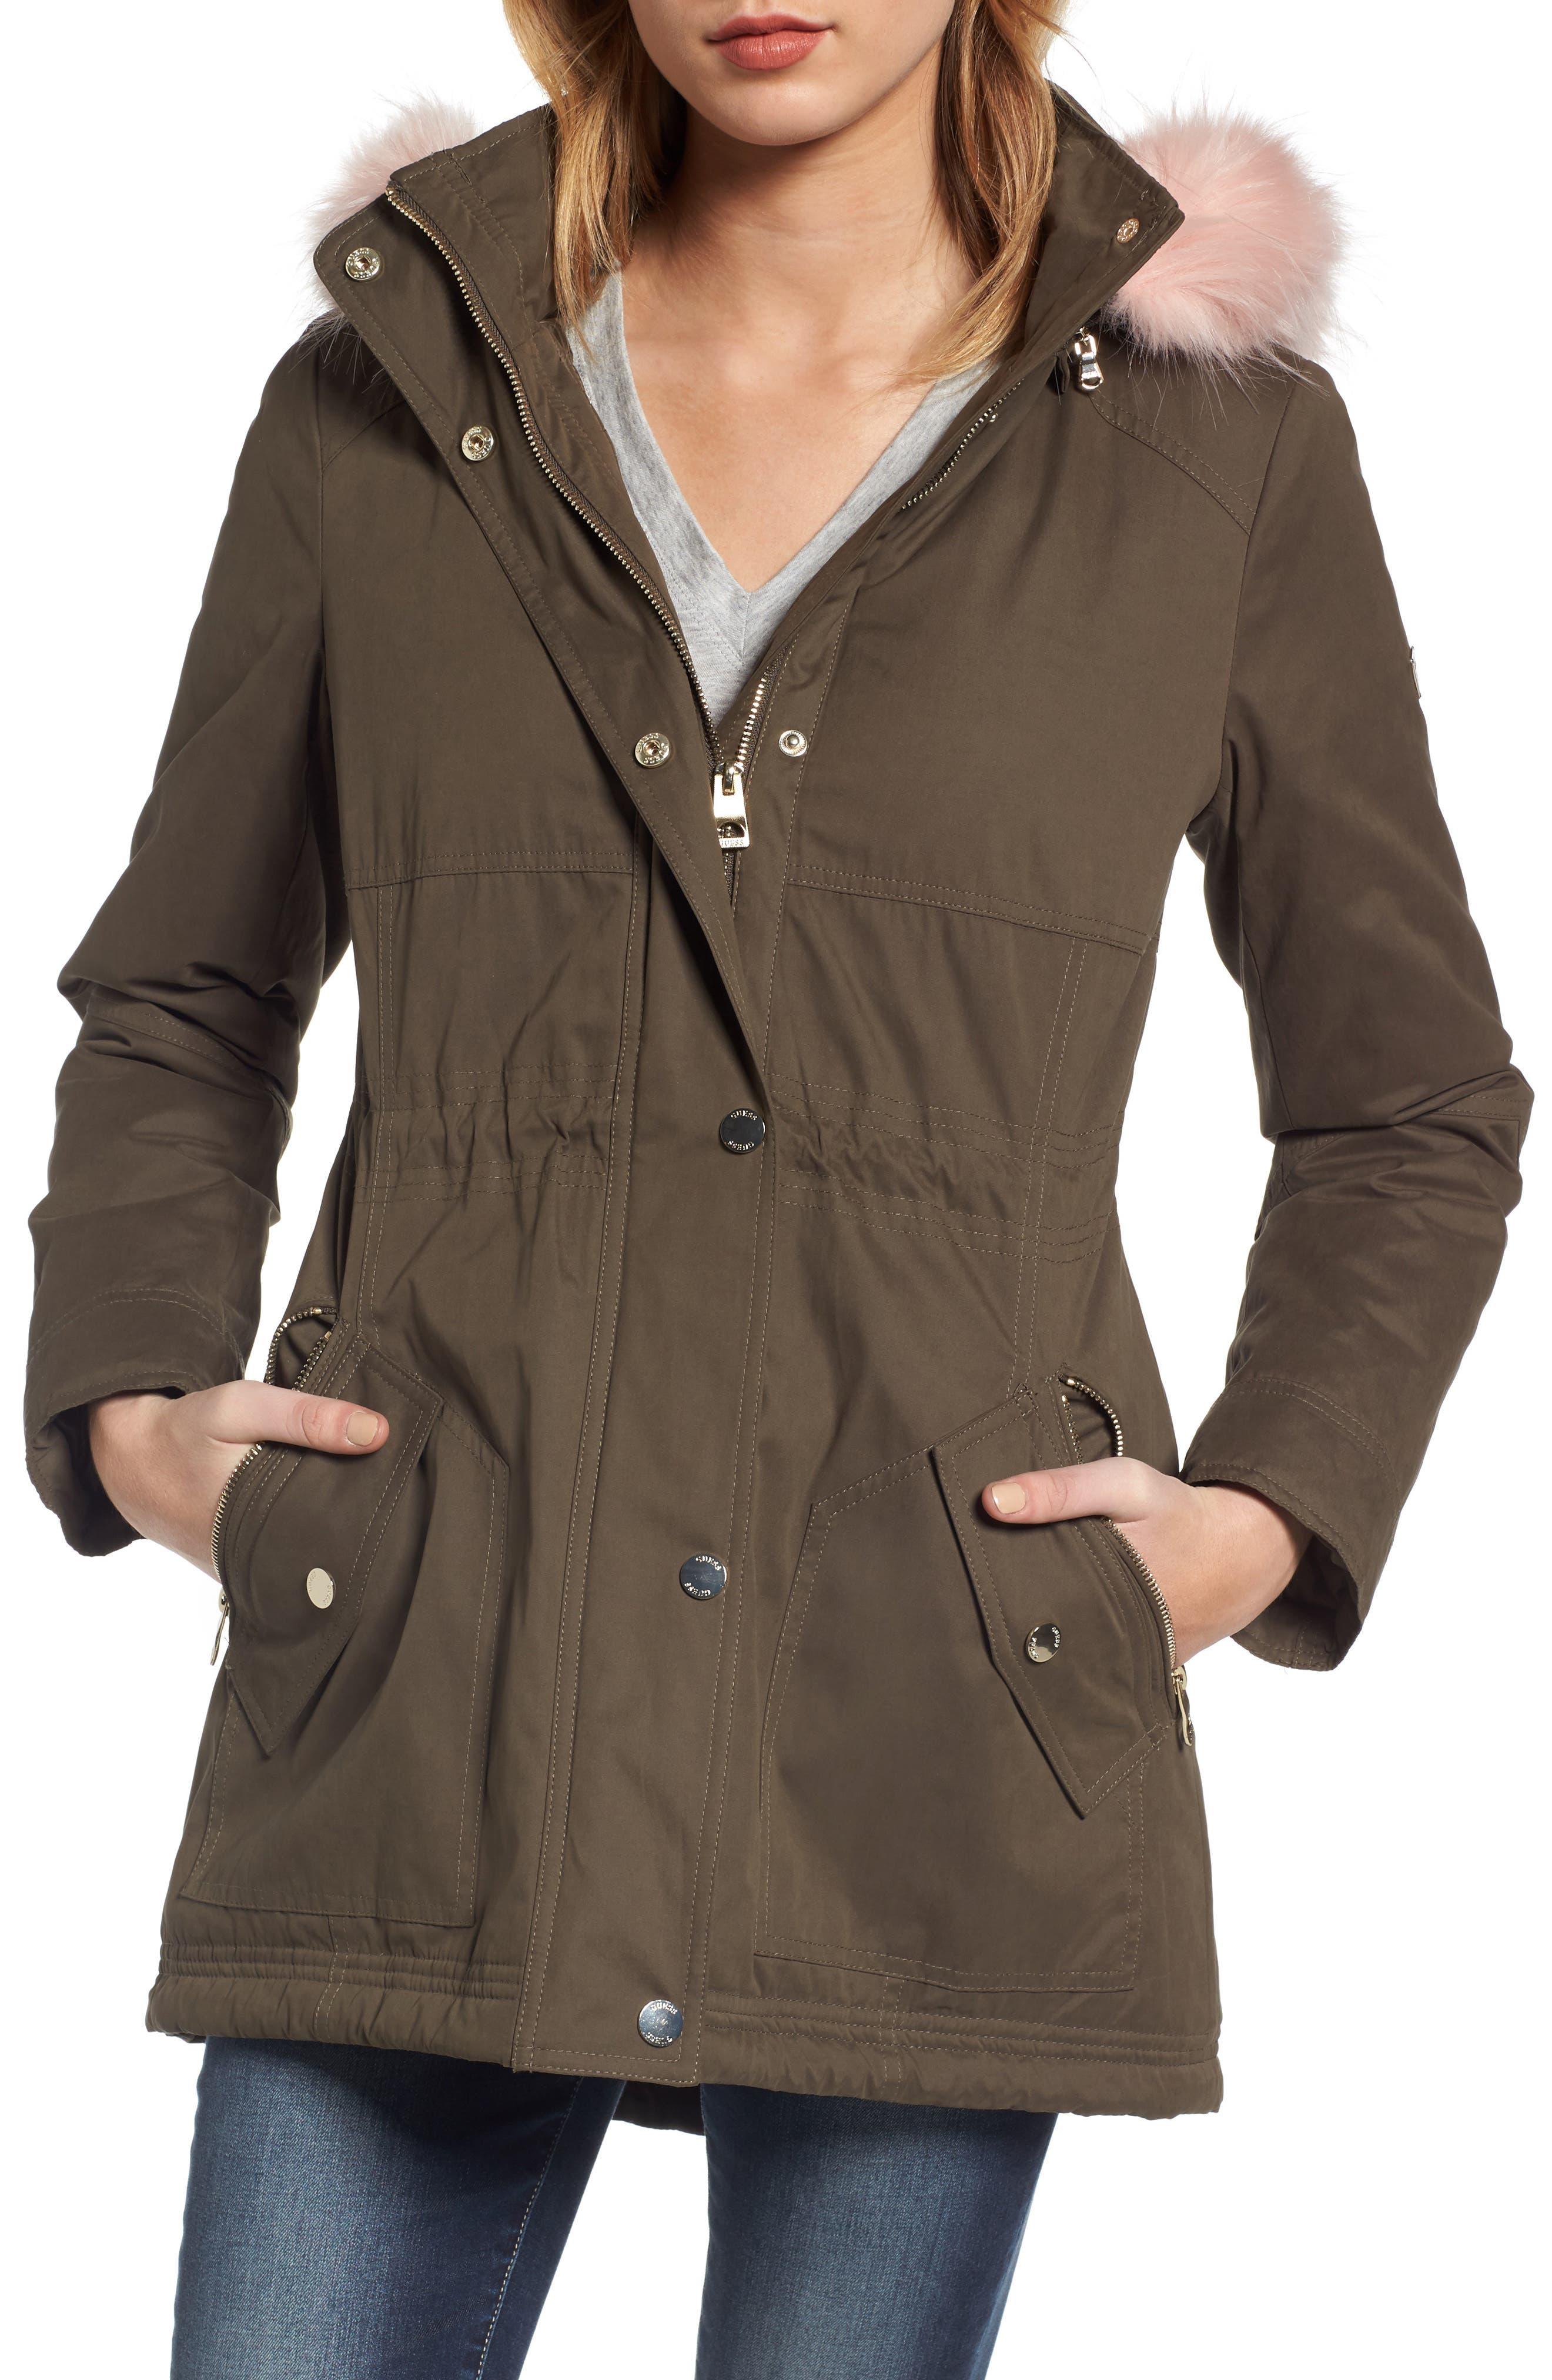 Guess coat hooded faux fur trim parka